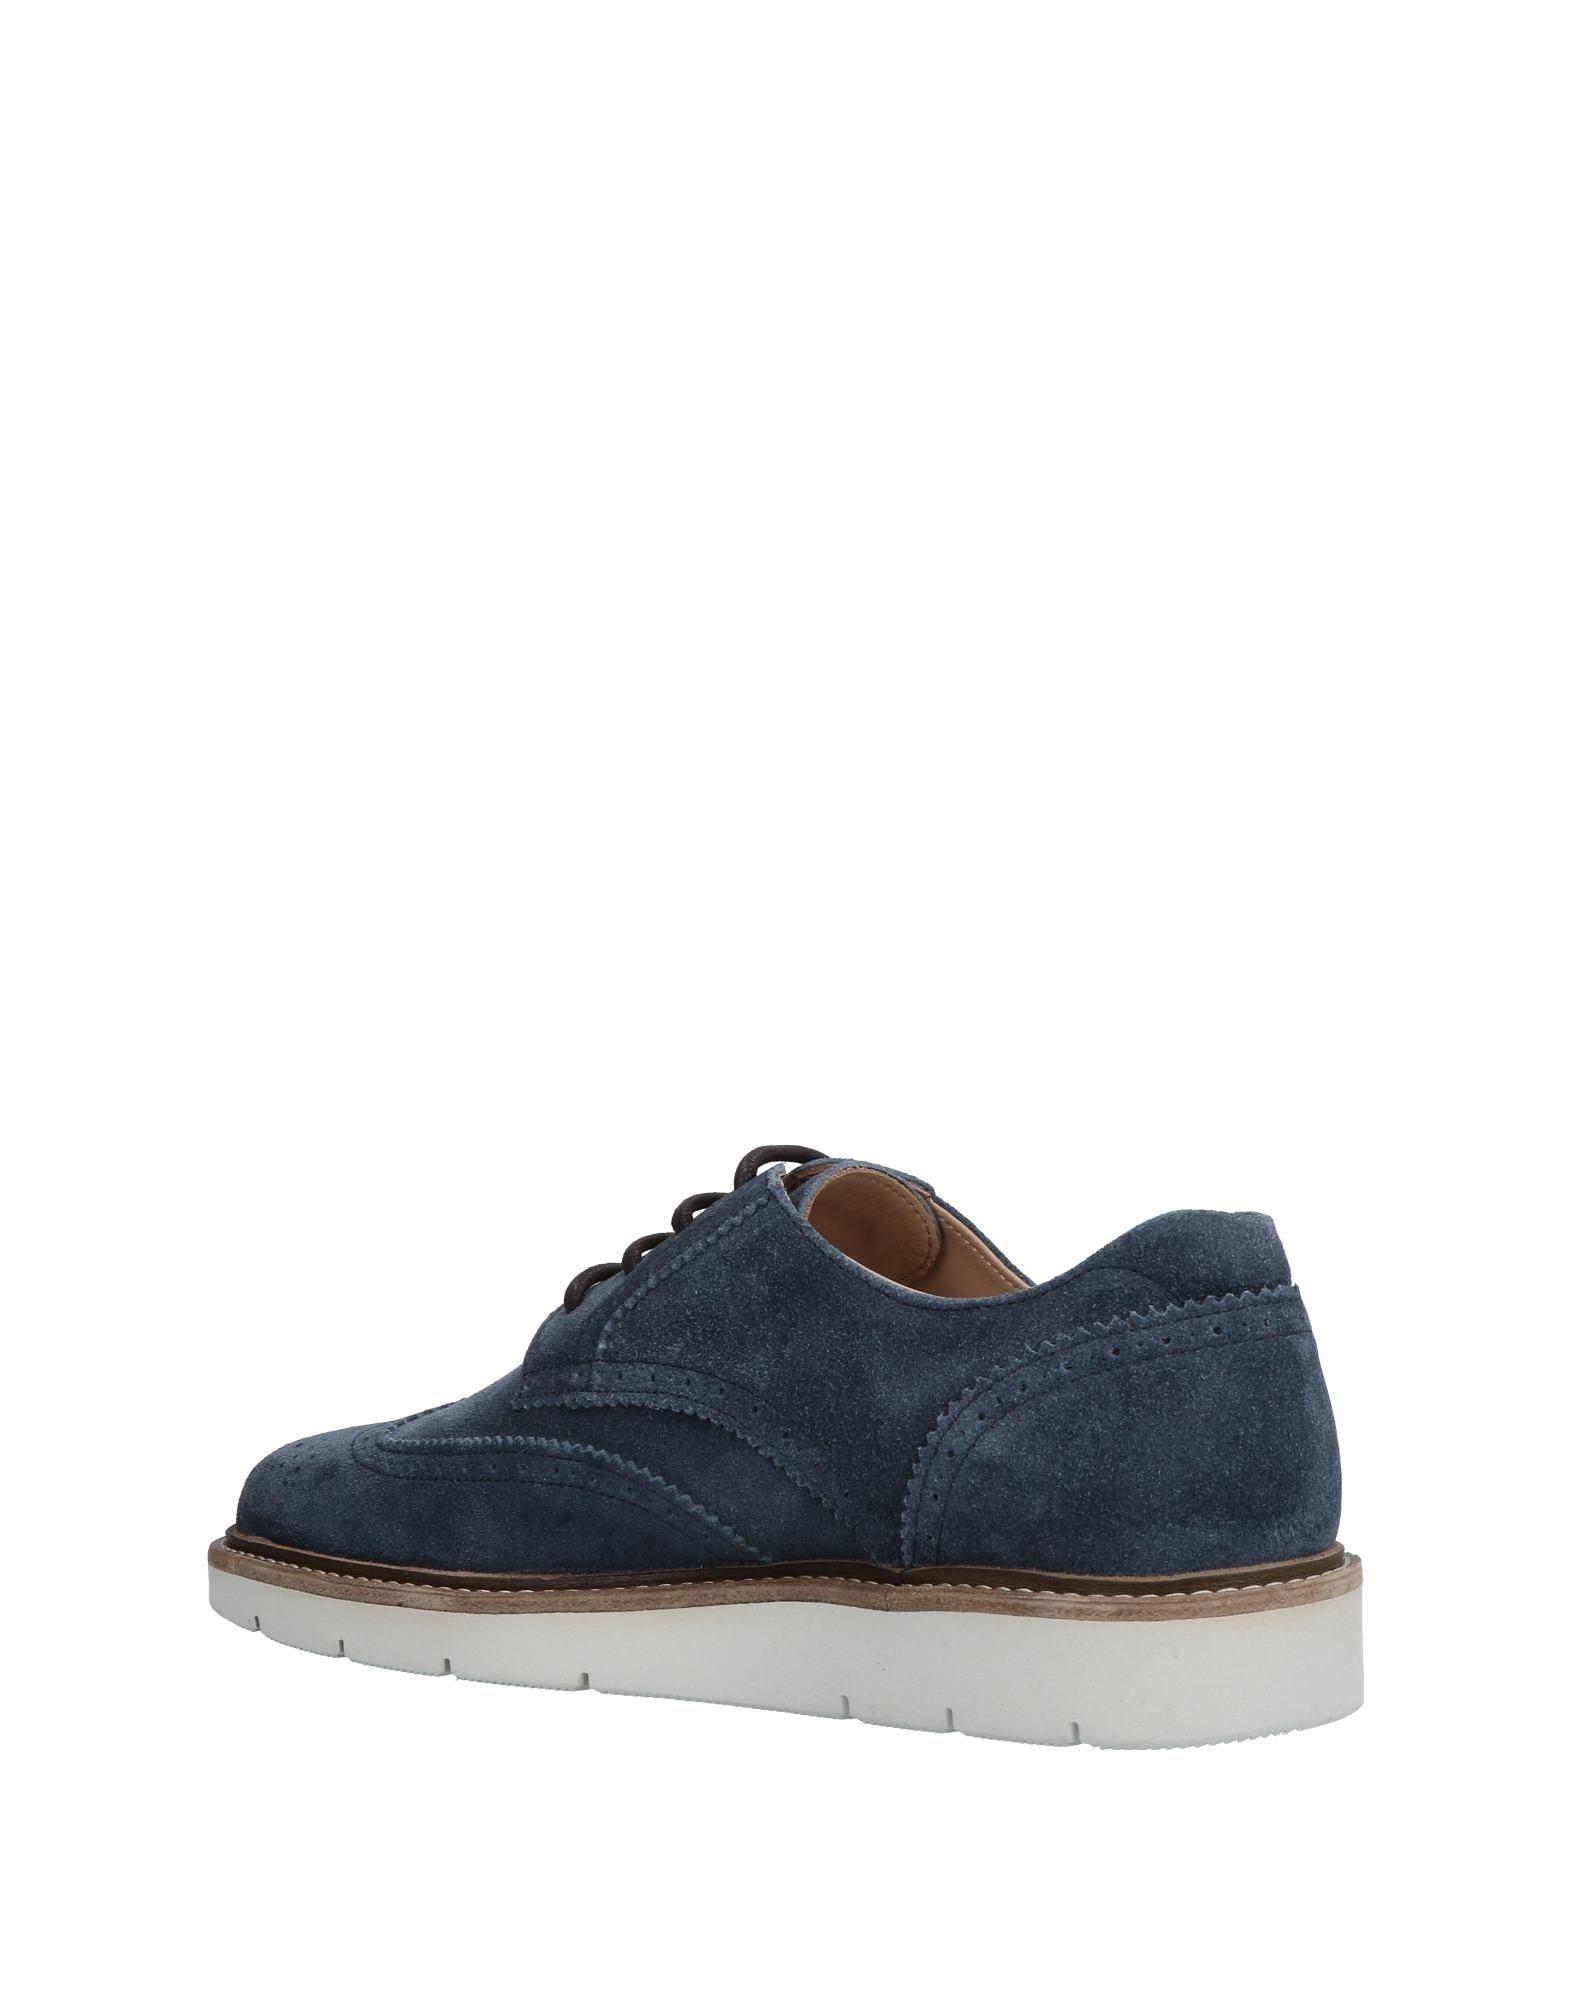 Rabatt echte Schuhe Hogan Schnürschuhe Herren  11515690LD